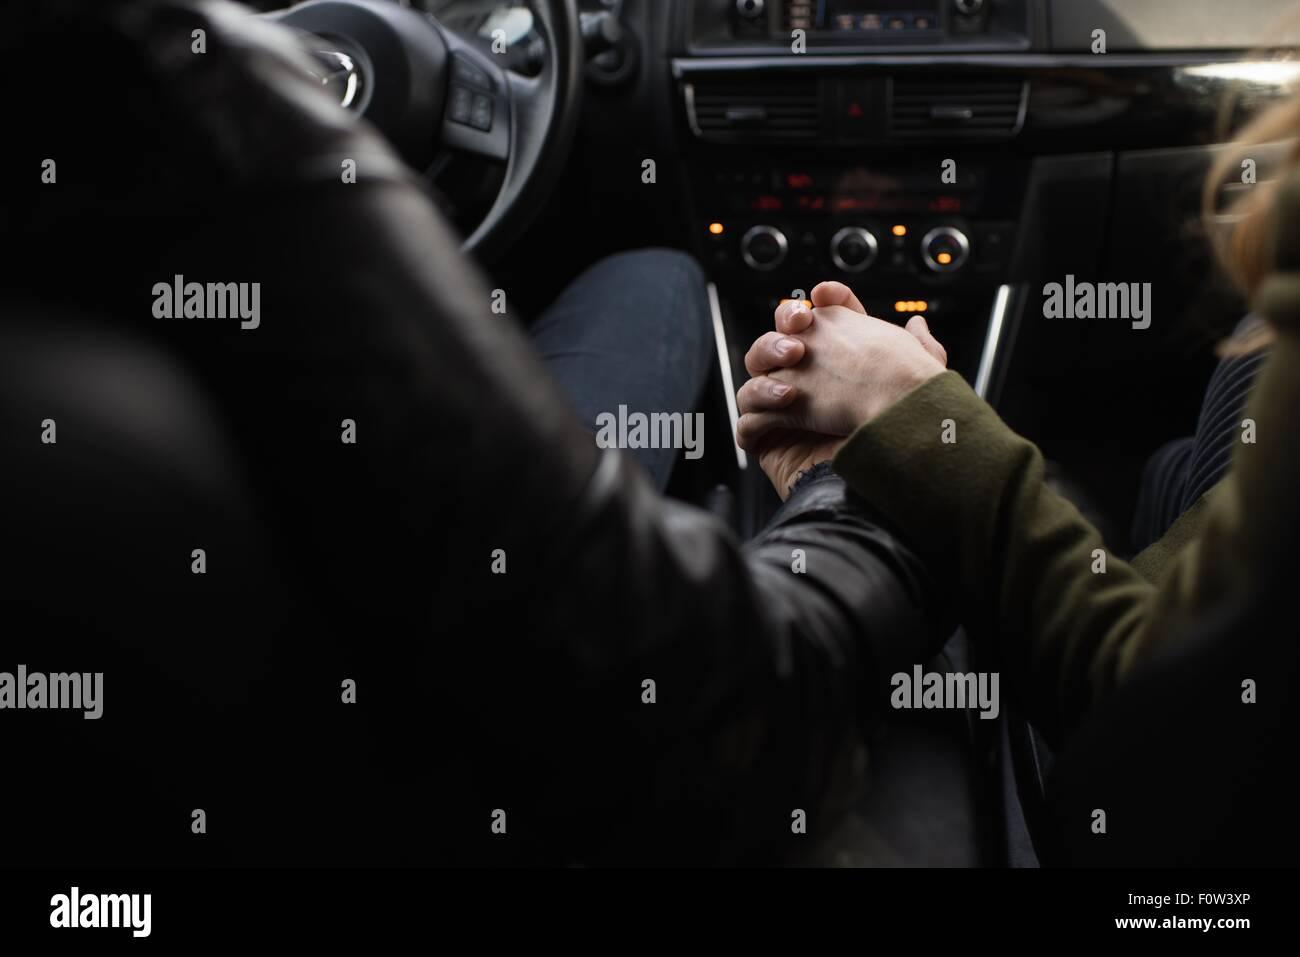 Couple holding hands inside vehicle - Stock Image